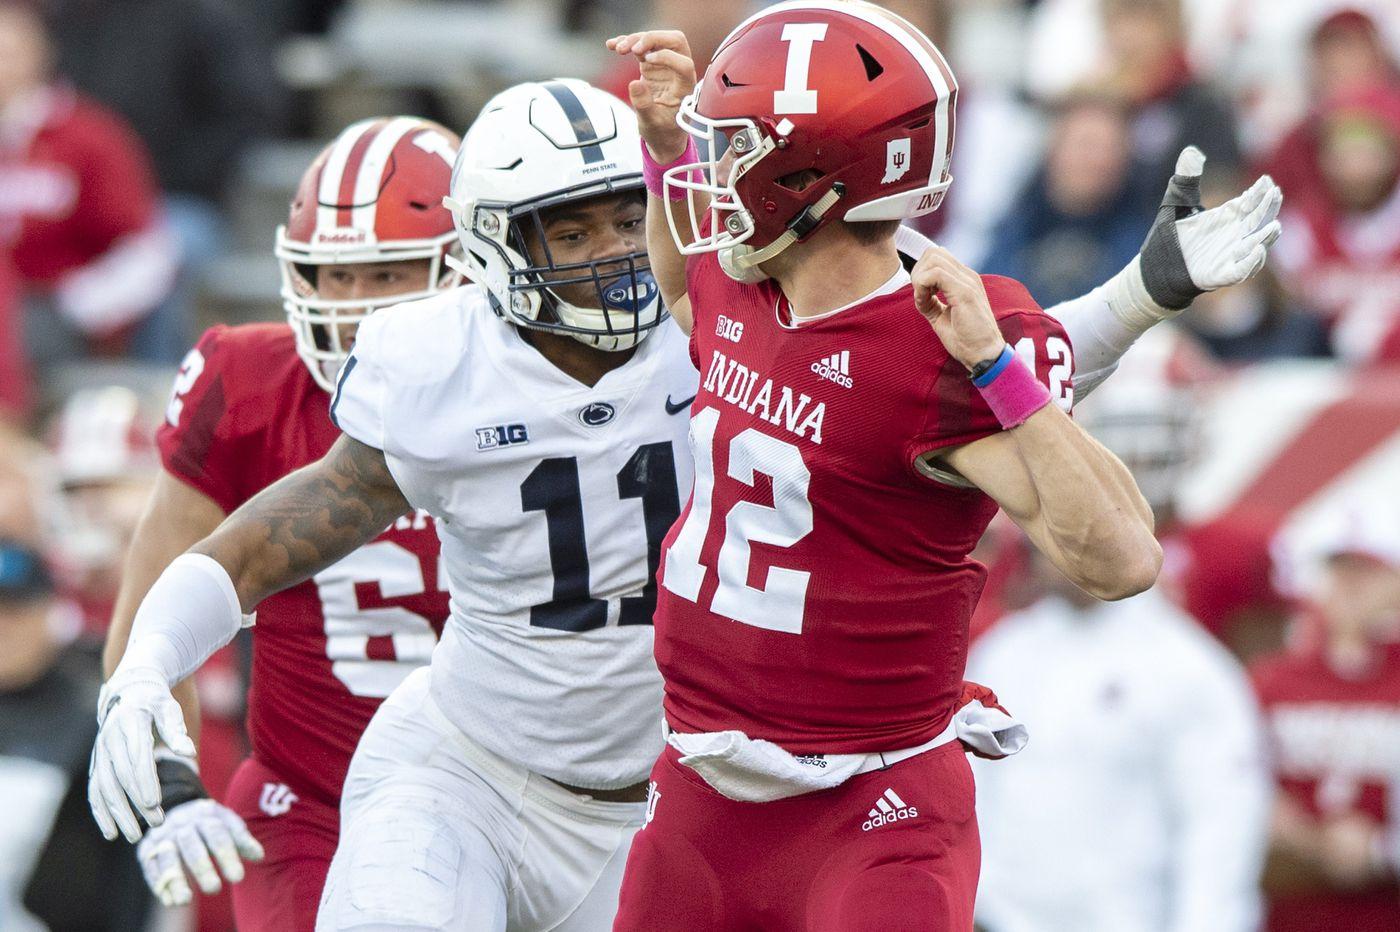 Improving Penn State defense seeks to extend Rutgers' struggles